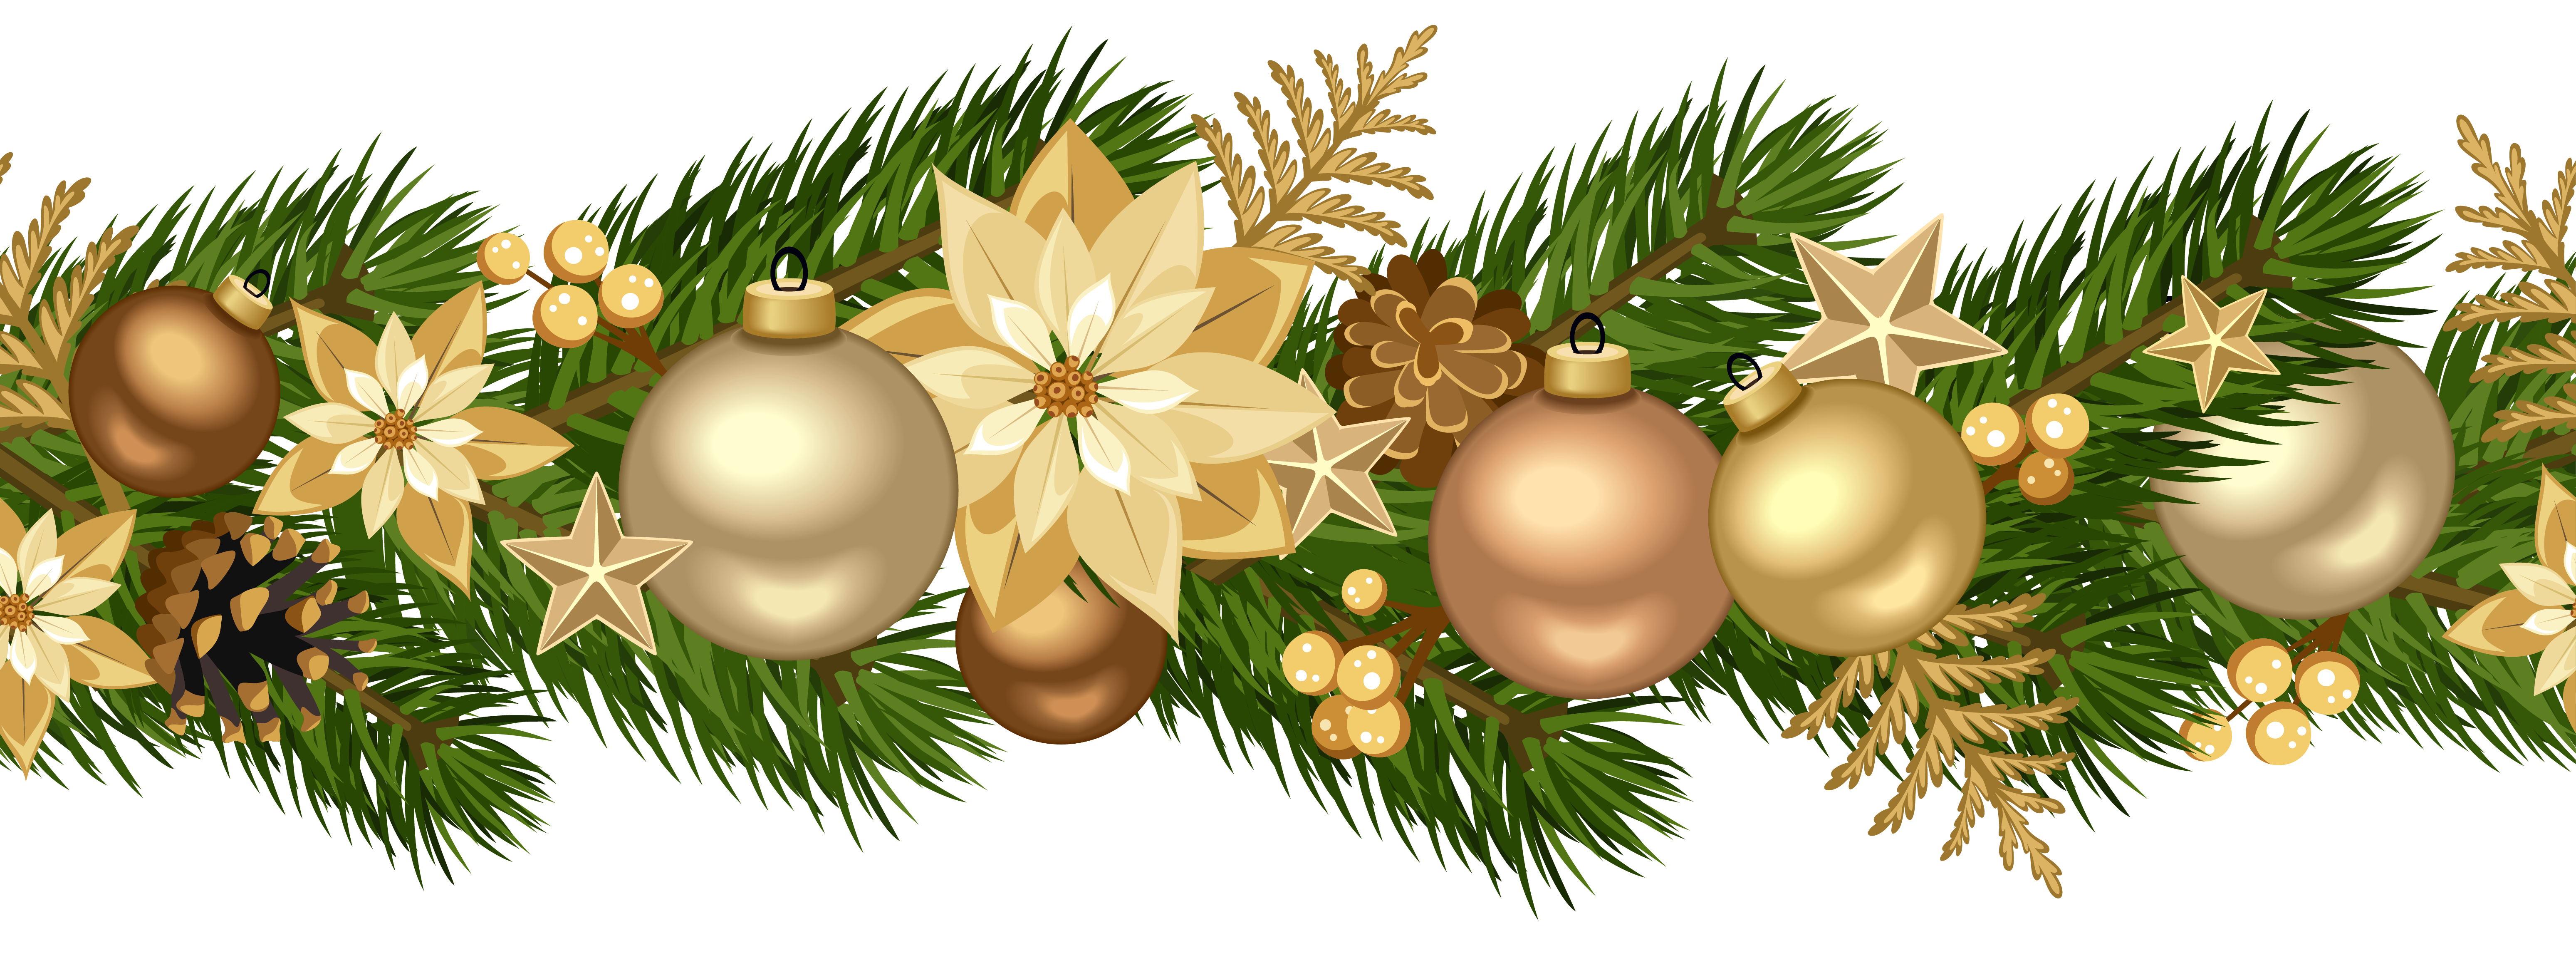 Christmas decorative golden.